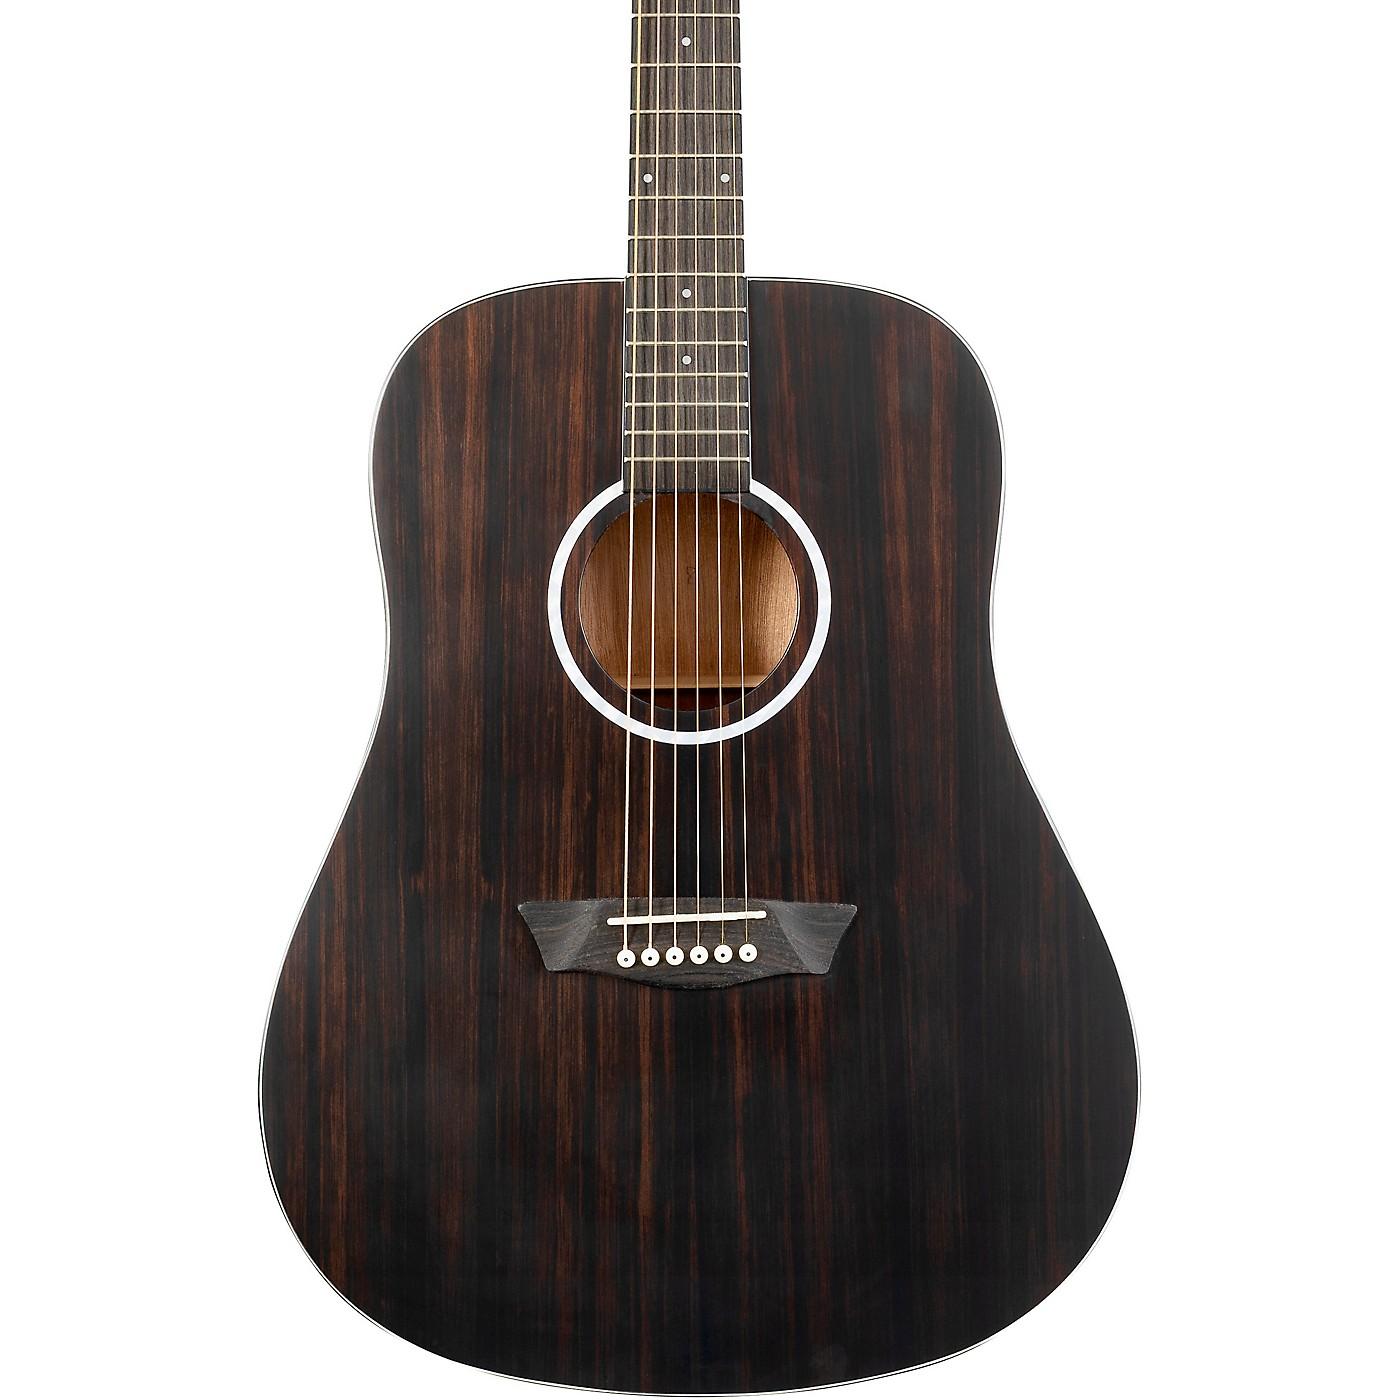 Washburn Deep Forest Ebony D Acoustic Guitar thumbnail